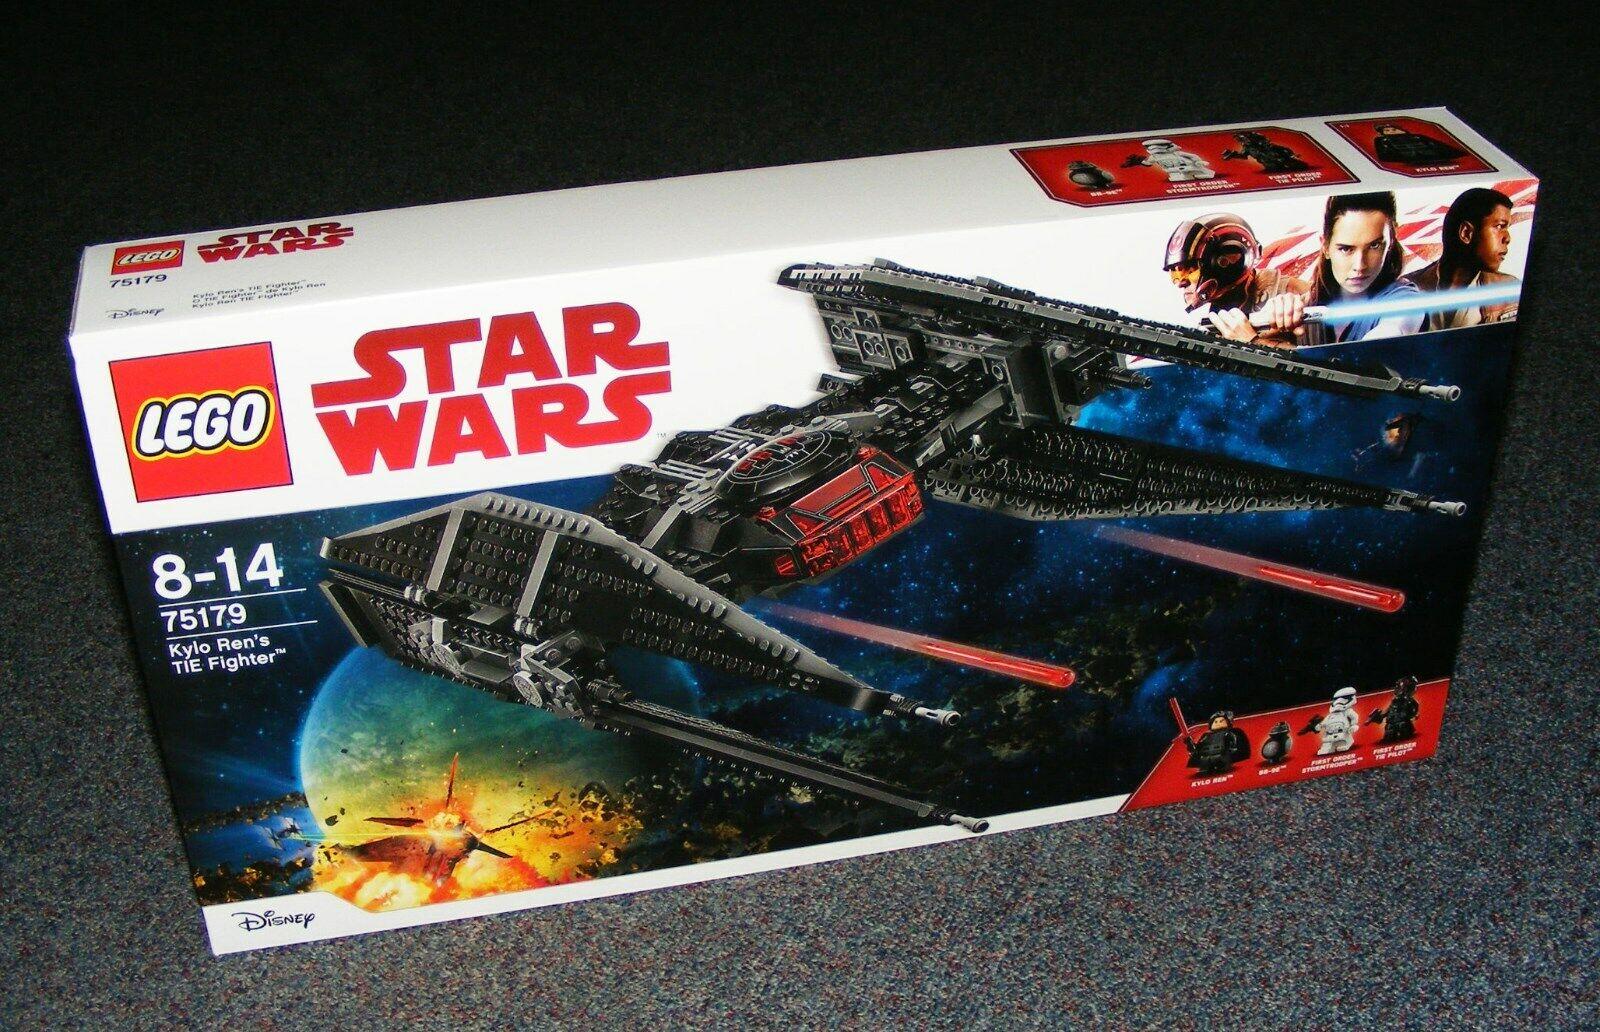 STAR WARS LEGO 75179 Kylo REN'S TIE FIGHTER neuf scellé Entièrement neuf dans sa boîte